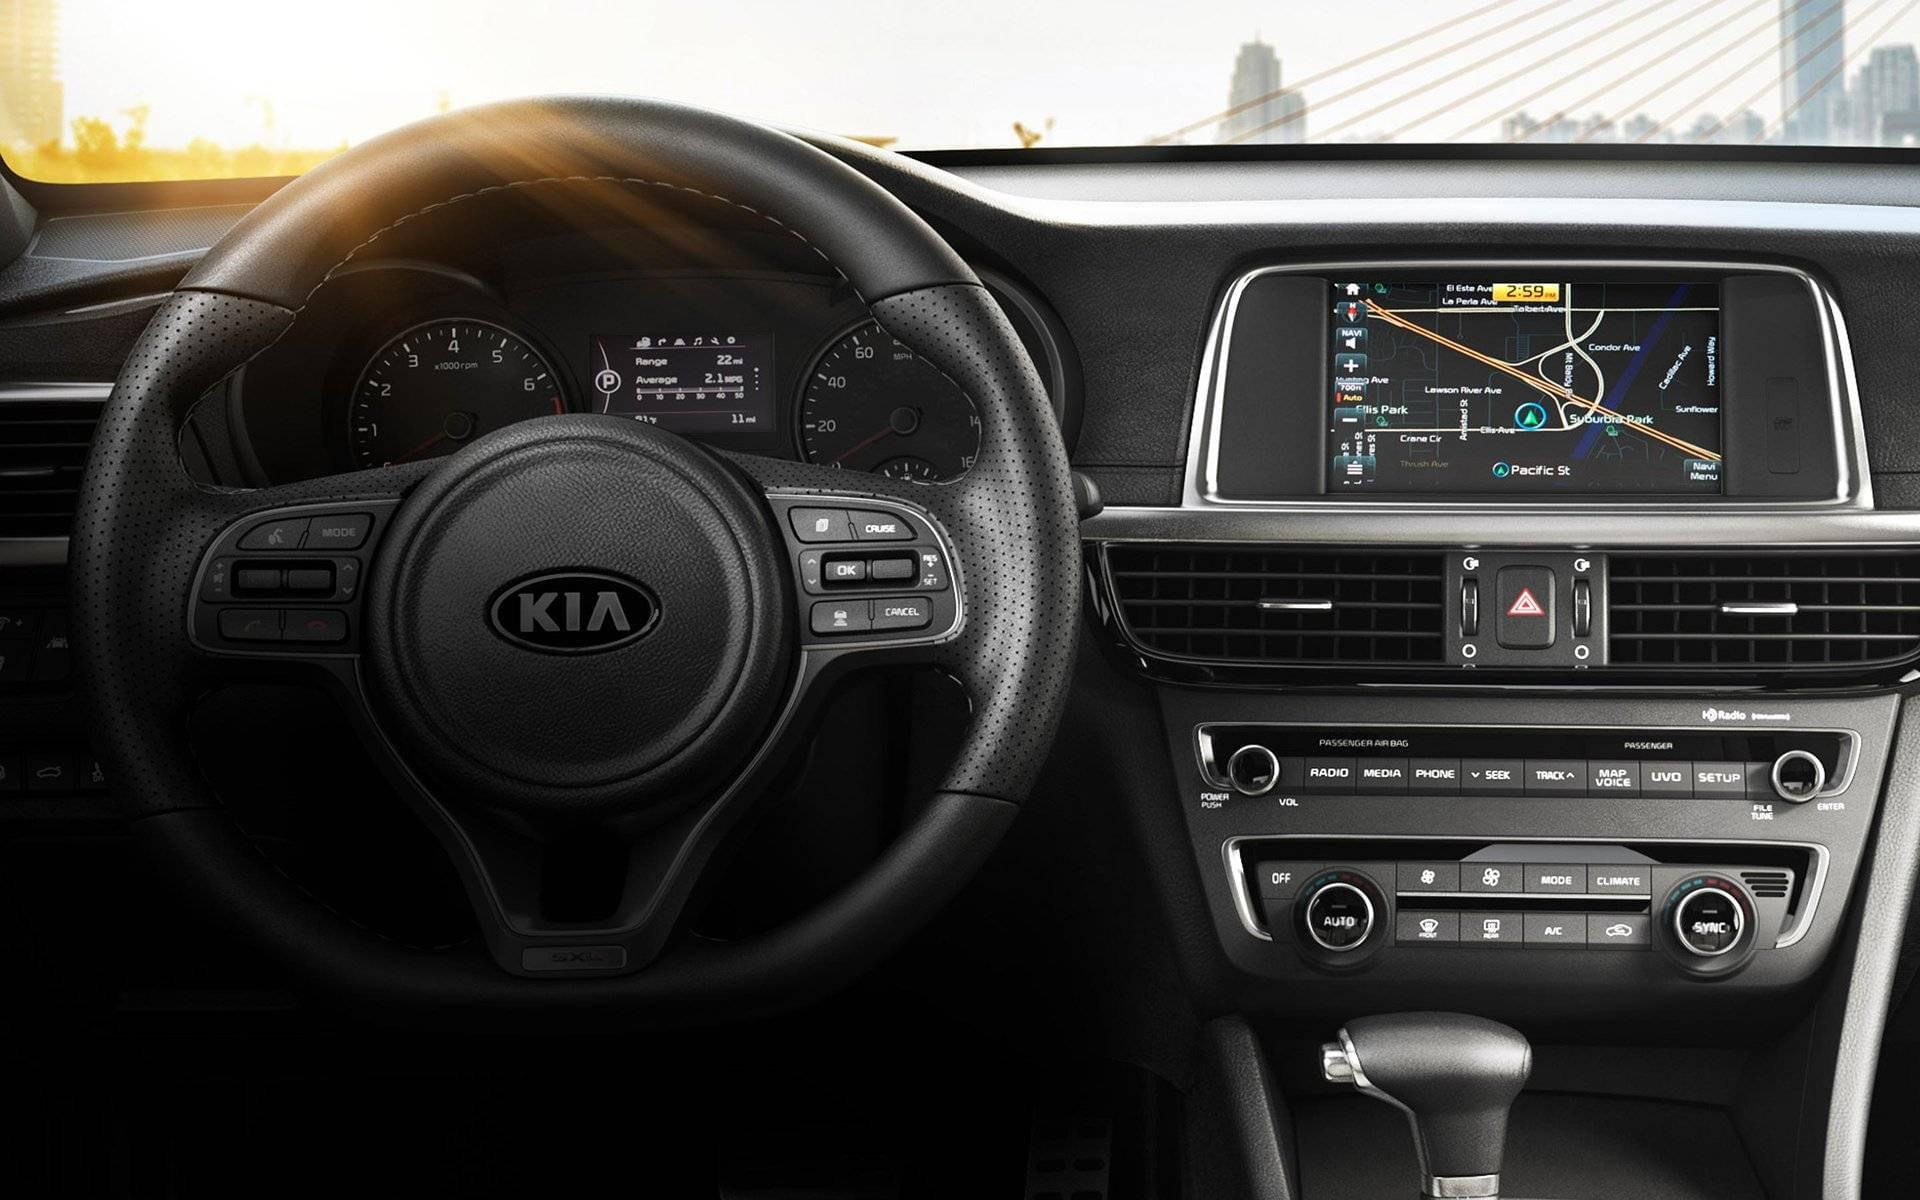 Background Optima 2016 Tech Overview-kia-1920x-jpg